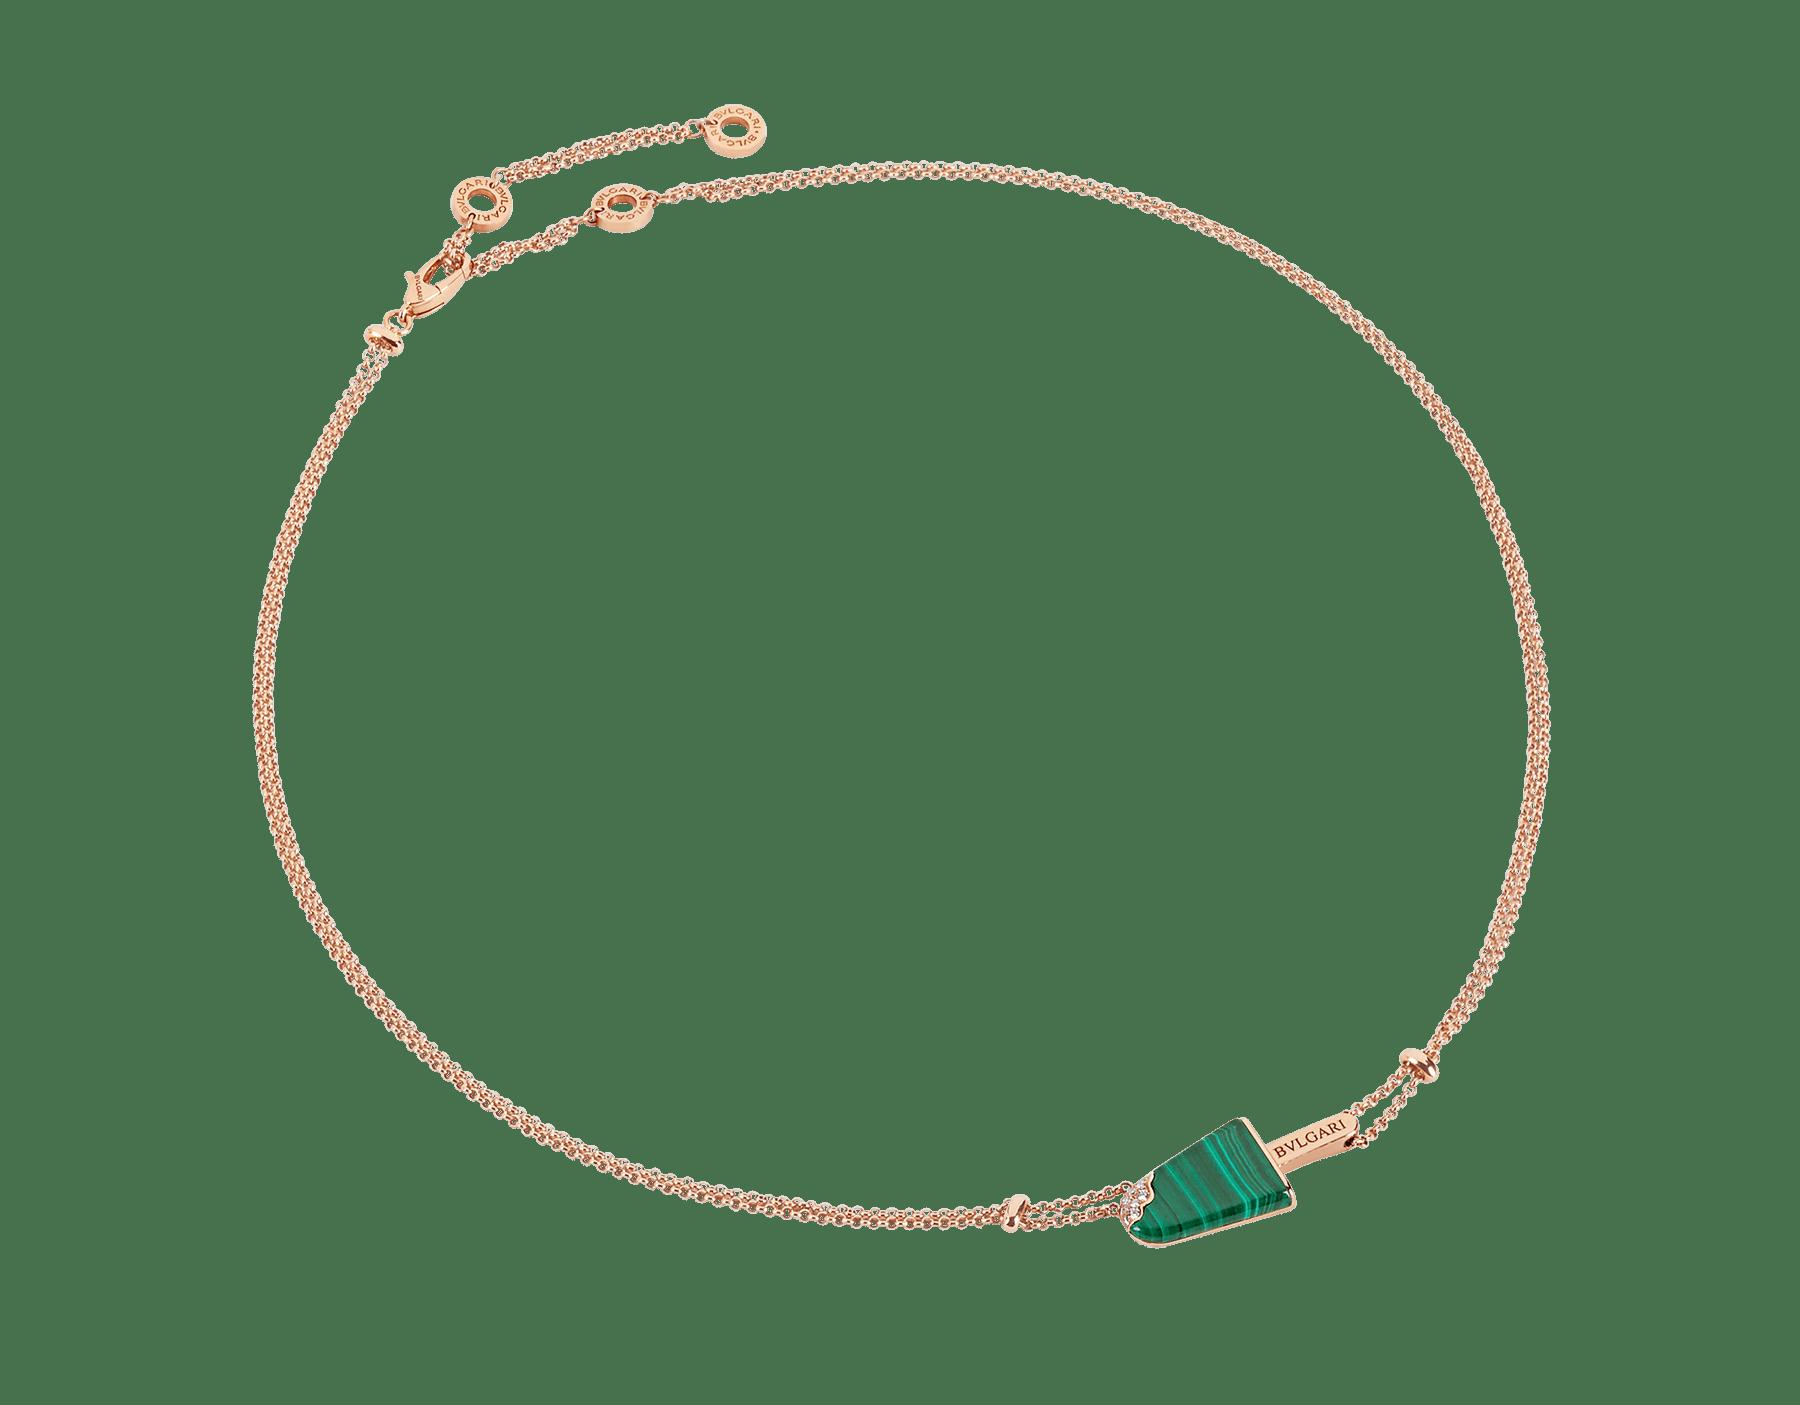 BVLGARI BVLGARI Gelati项链,18K玫瑰金材质,镶嵌孔雀石,饰以密镶钻石 356186 image 1